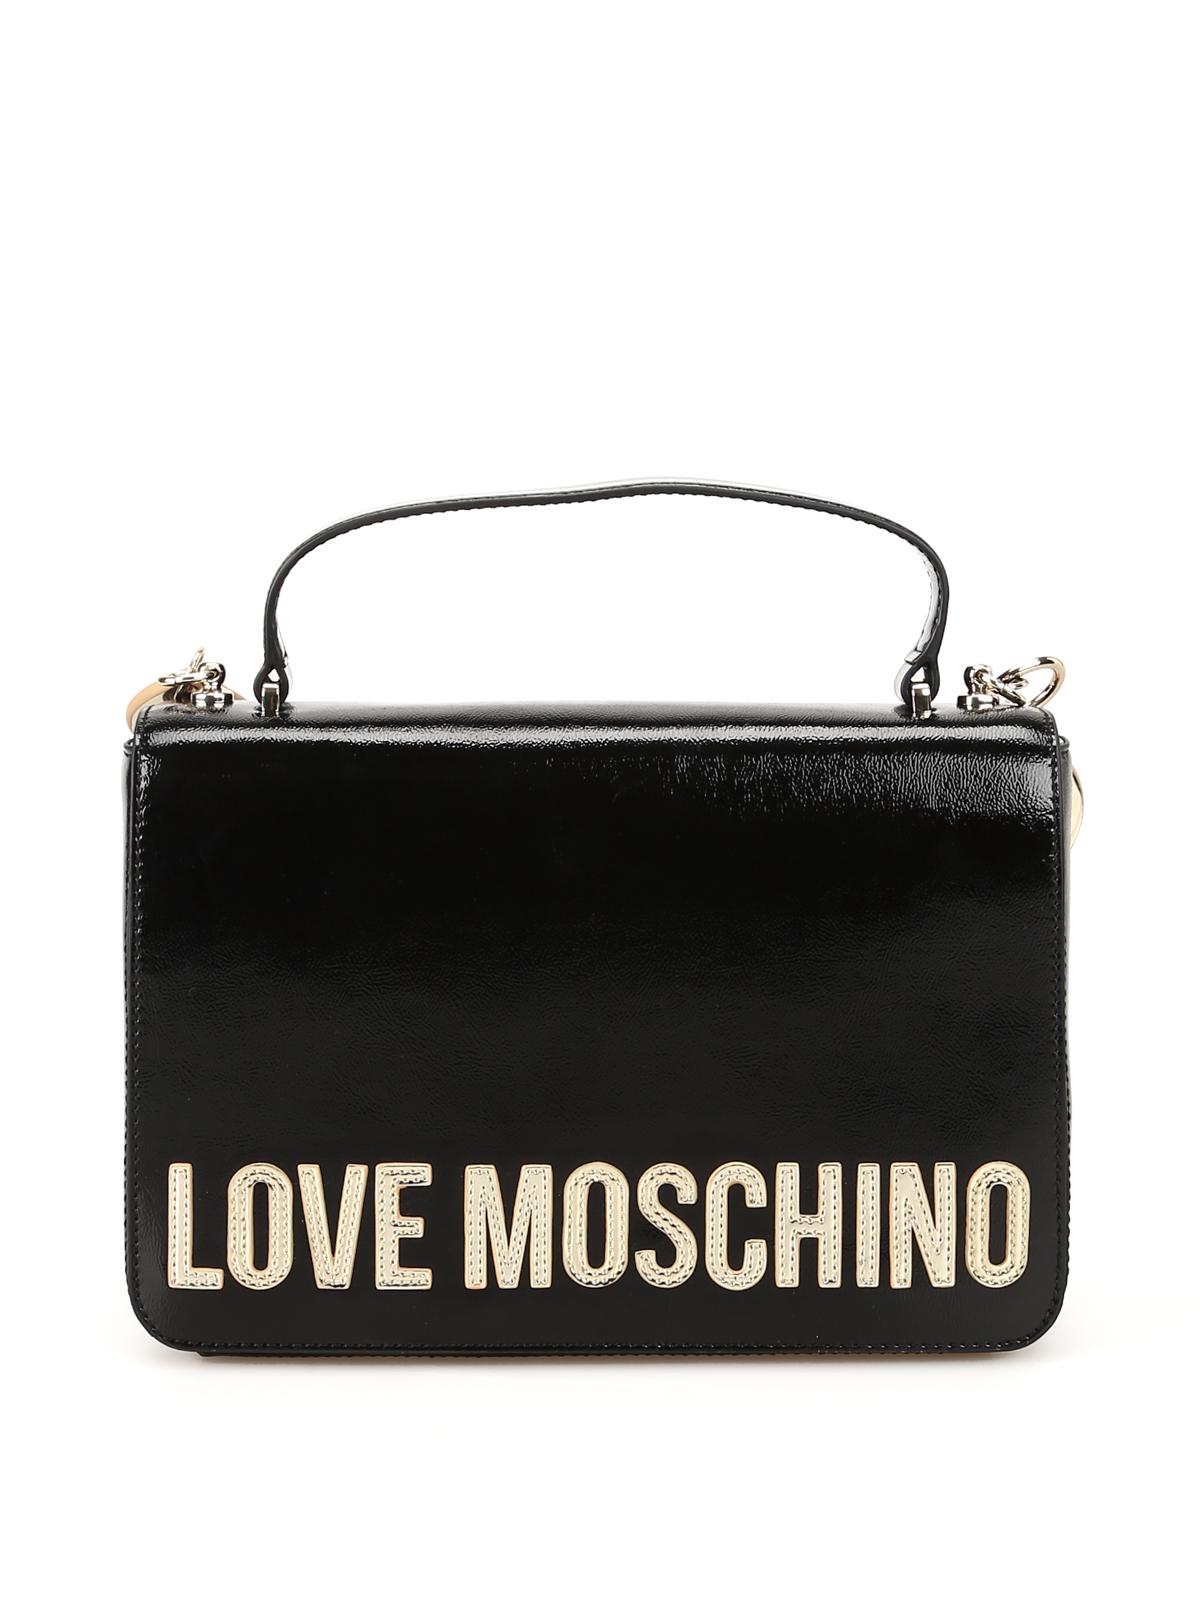 Love Moschino Borsa in vernice con maxi logo applicato